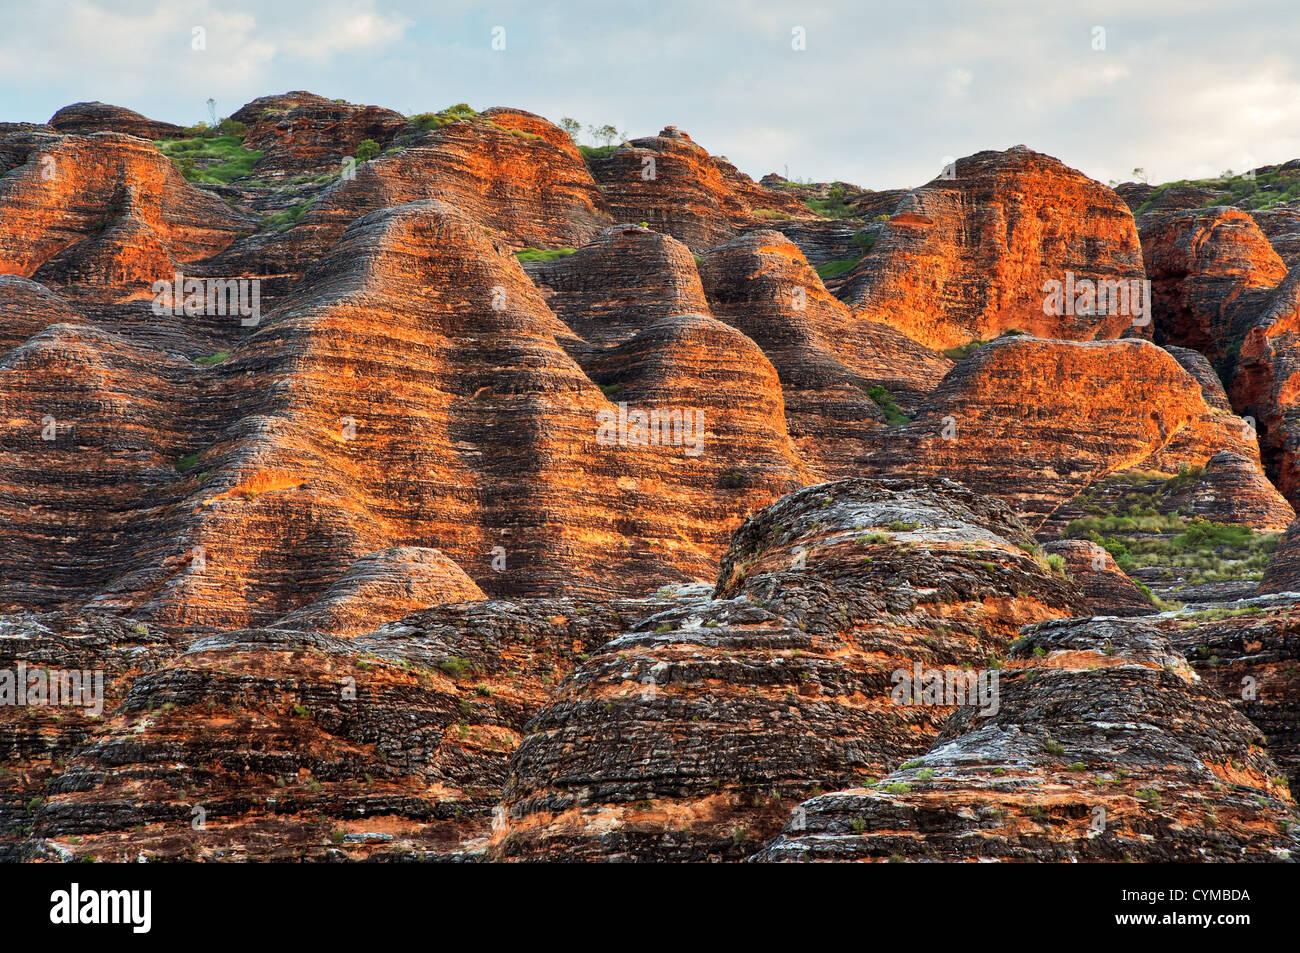 The Beehive Domes of the Bungle Bungle Range. - Stock Image